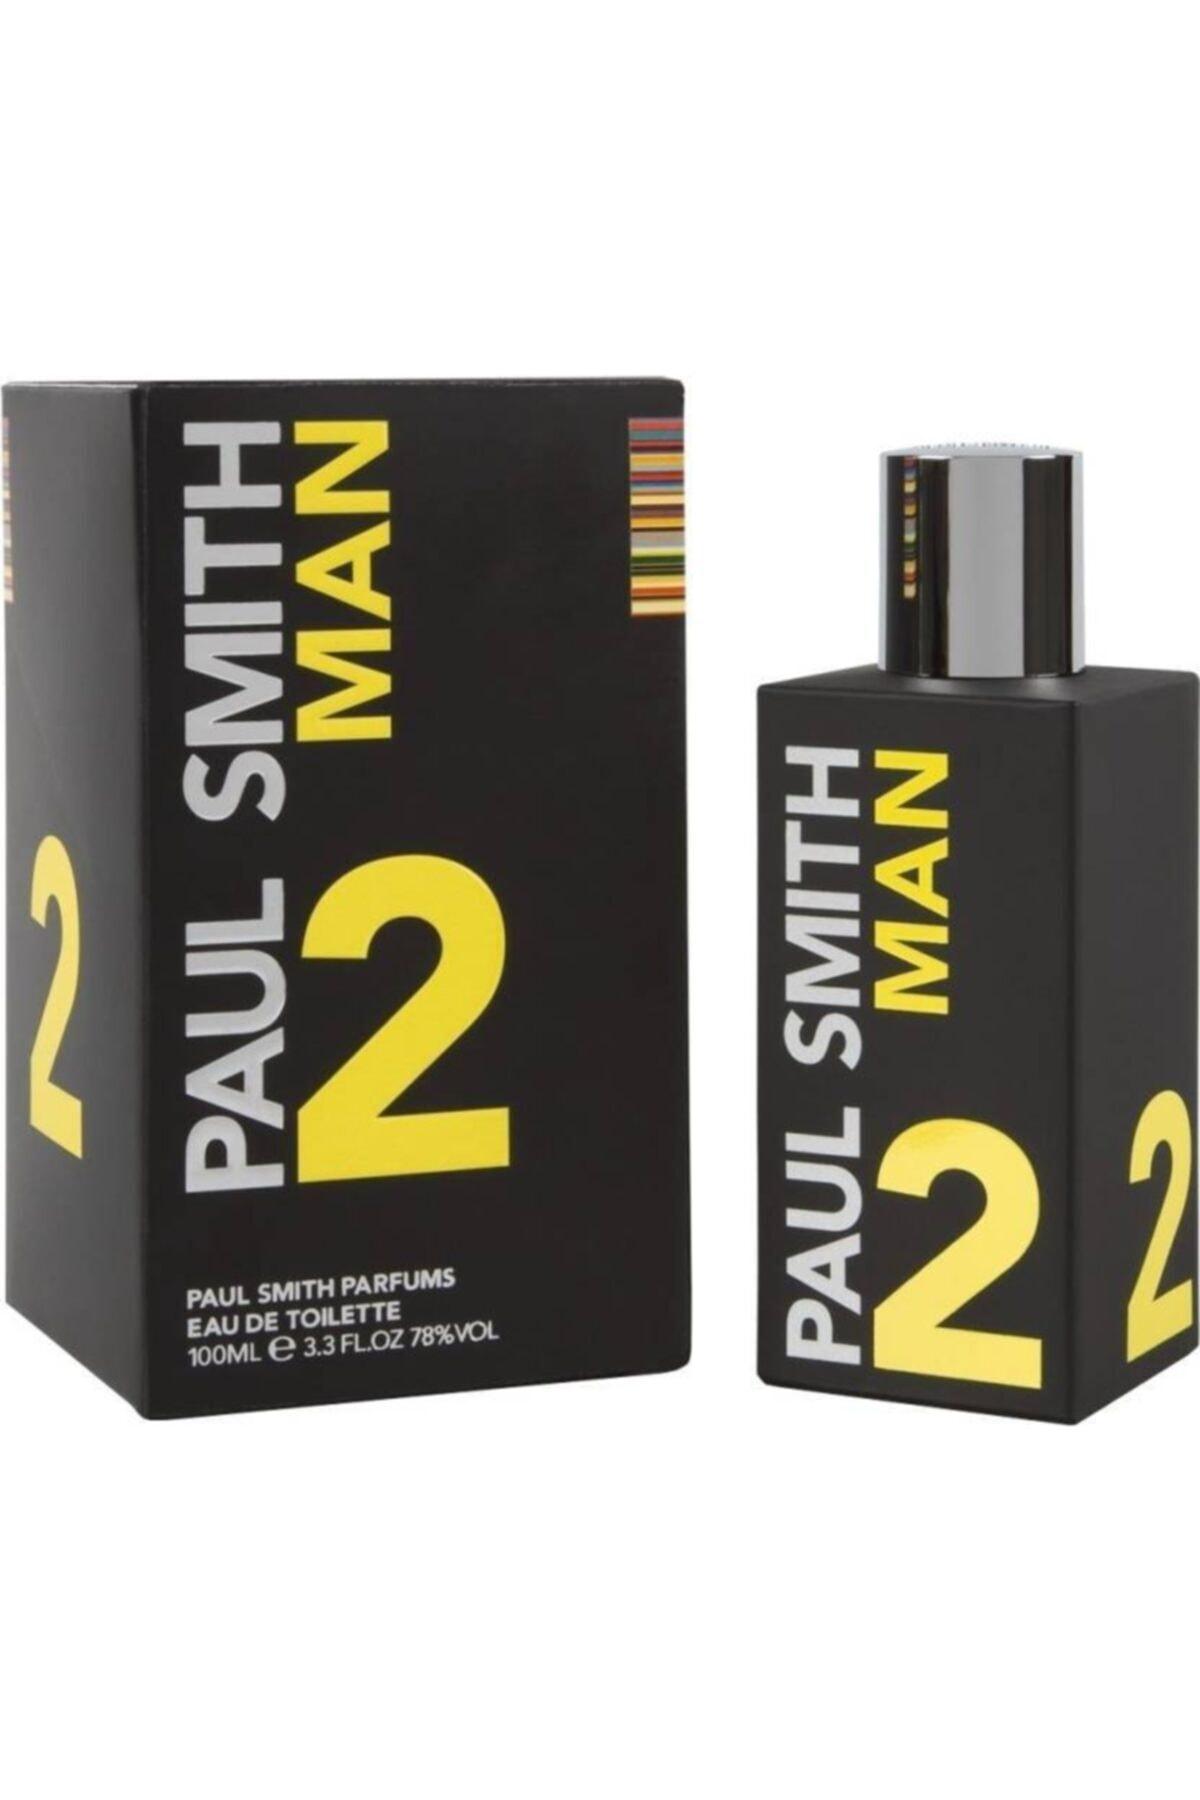 Paul Smith Man 2 Edt 100 Ml 1